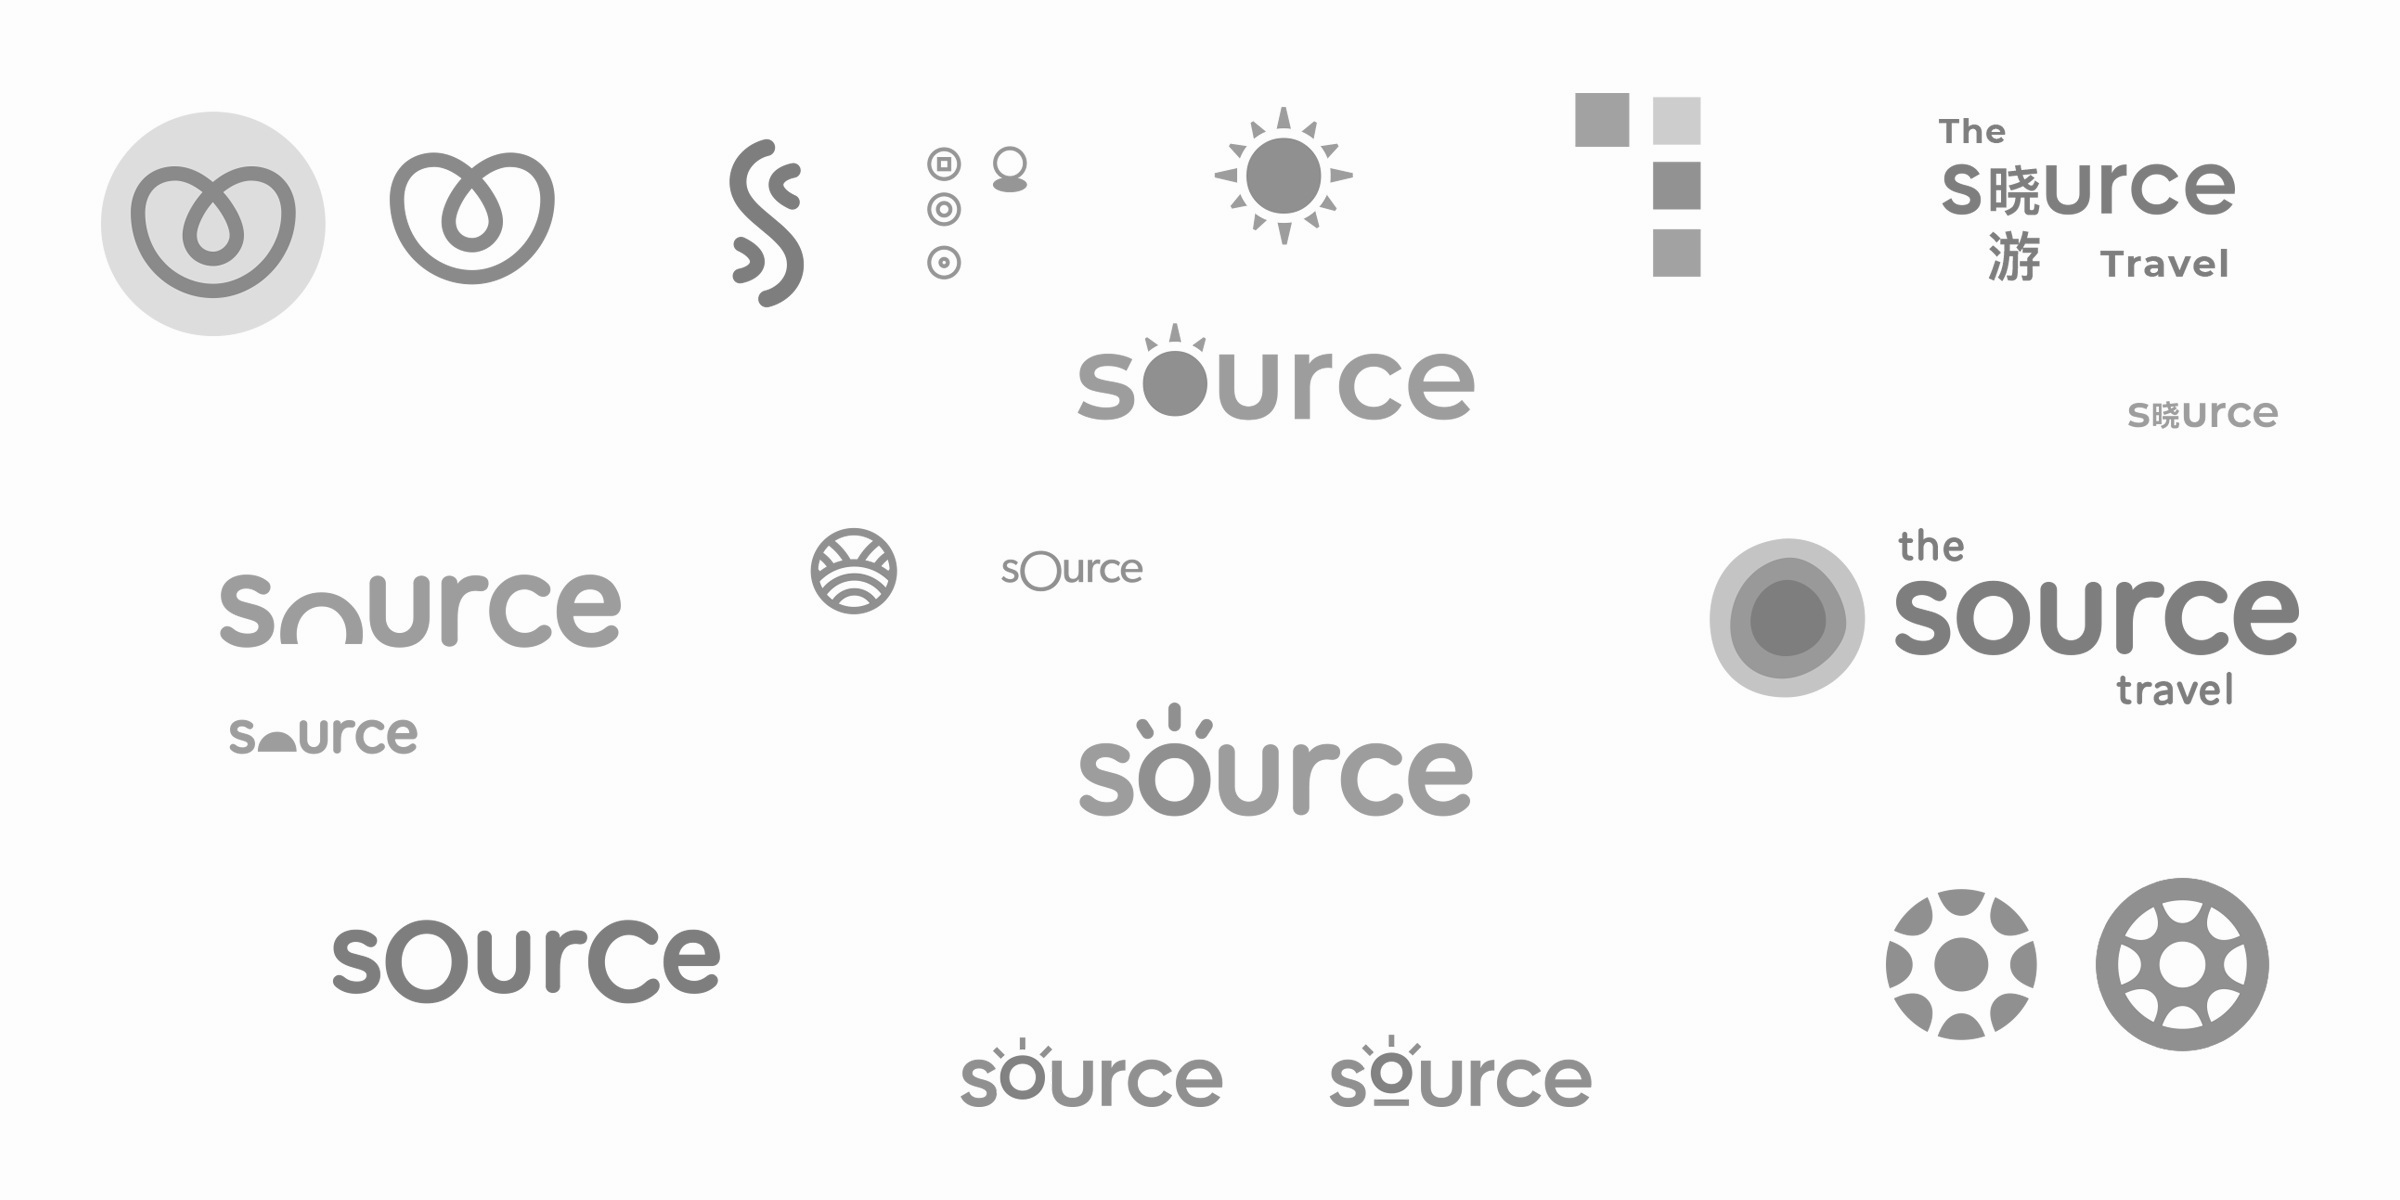 Source_Explore.jpg